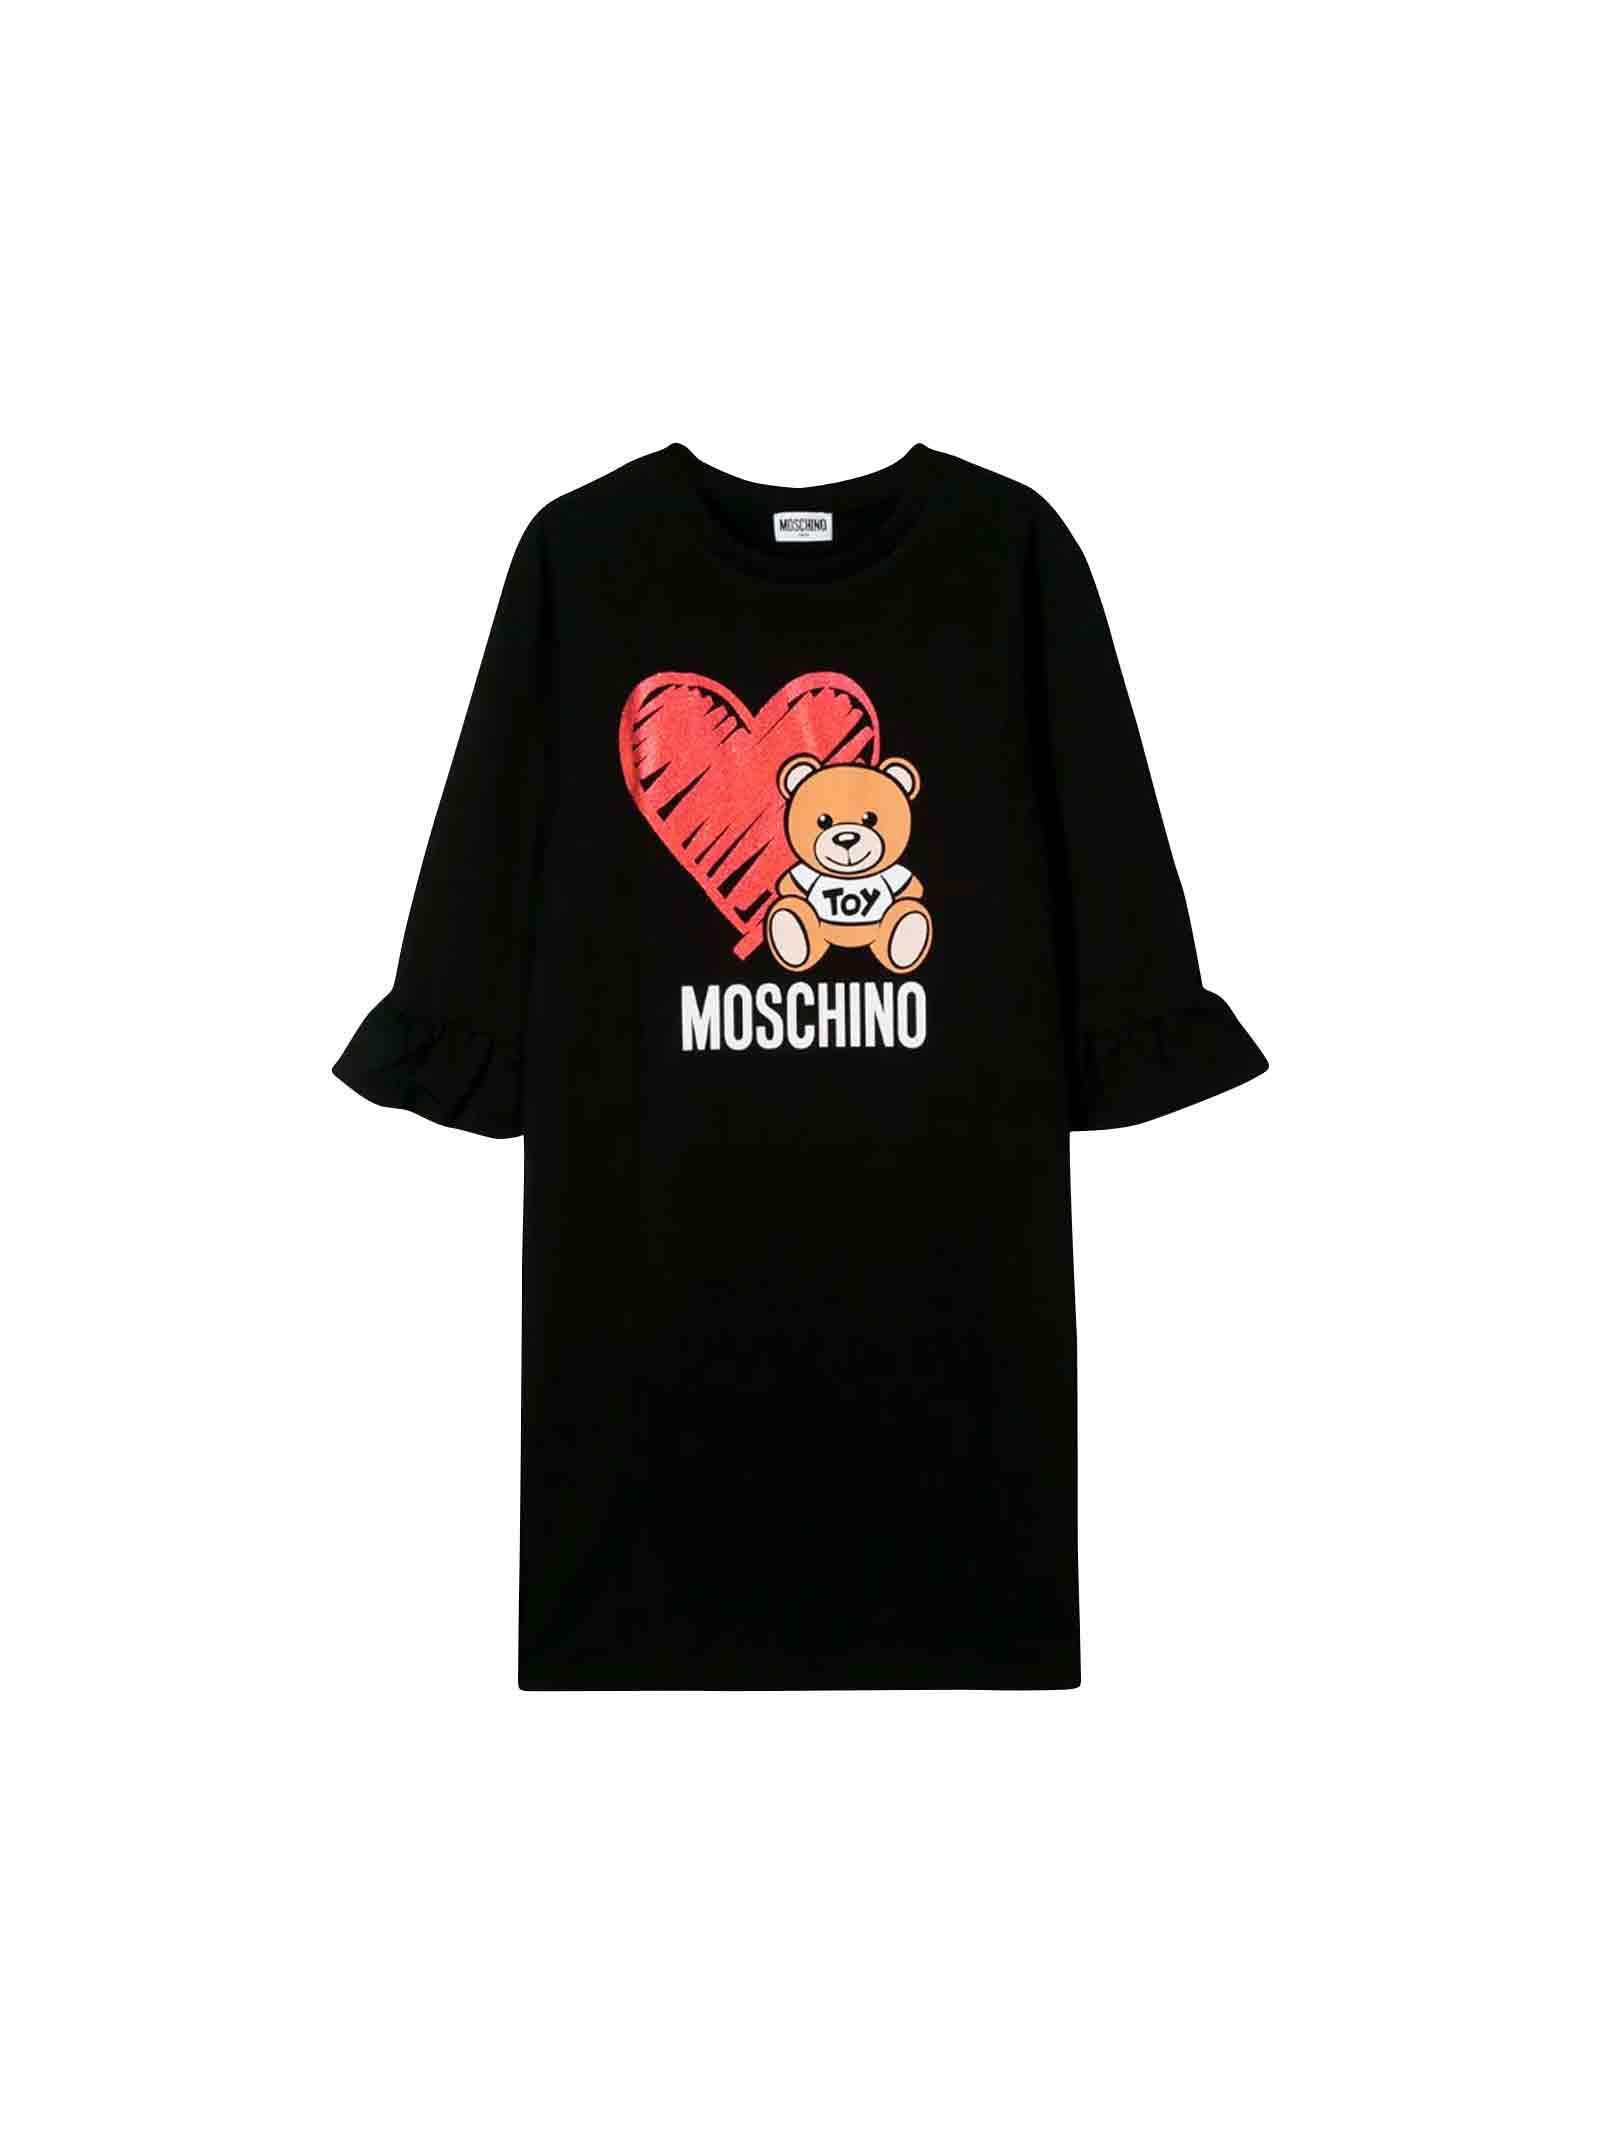 Moschino Black Dress Teen